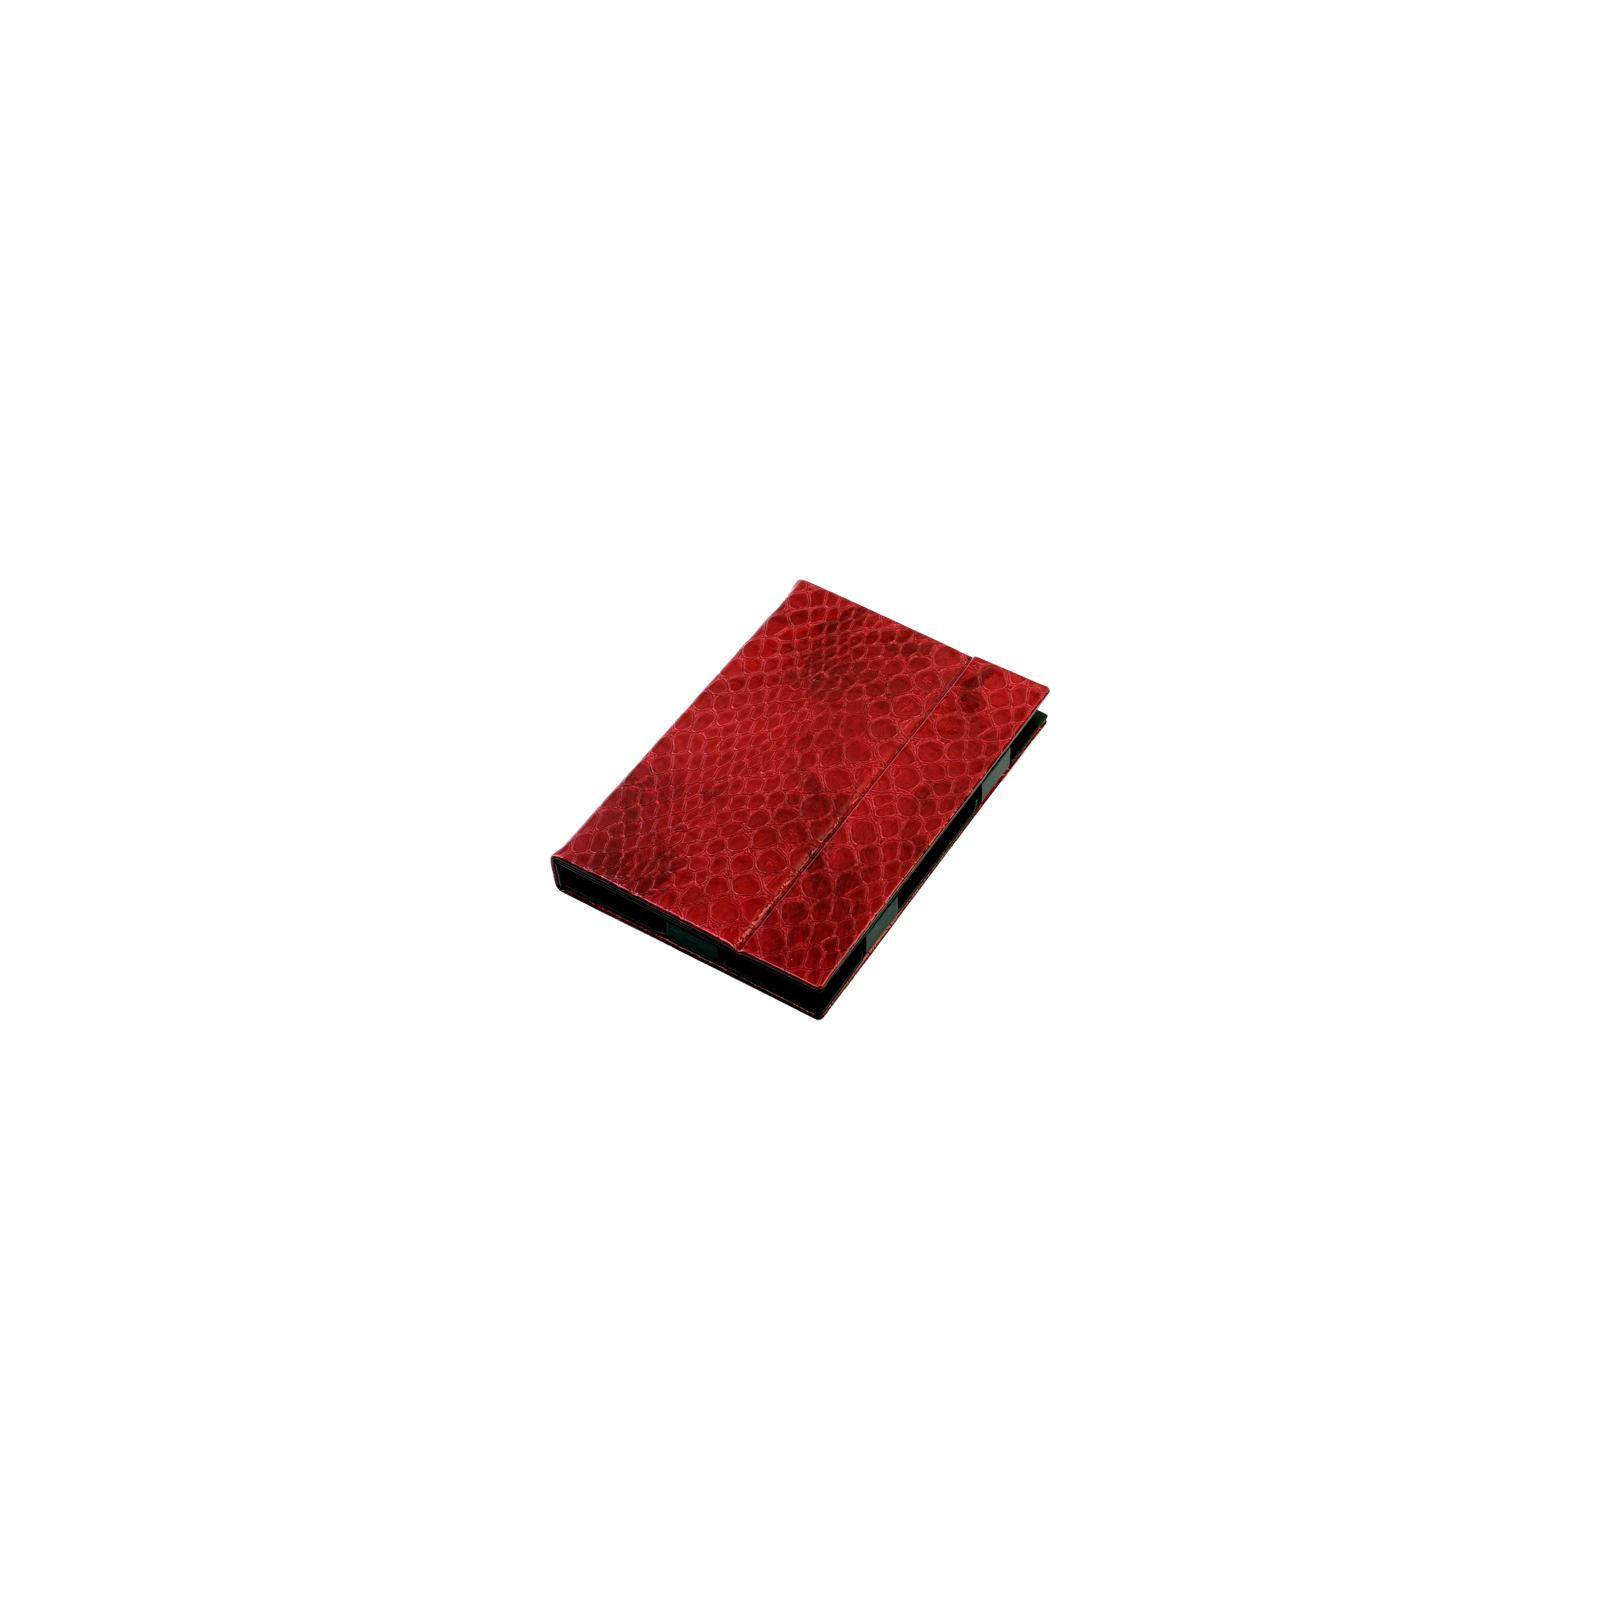 Чехол для планшета Vento 9 Desire glossy - red reptile